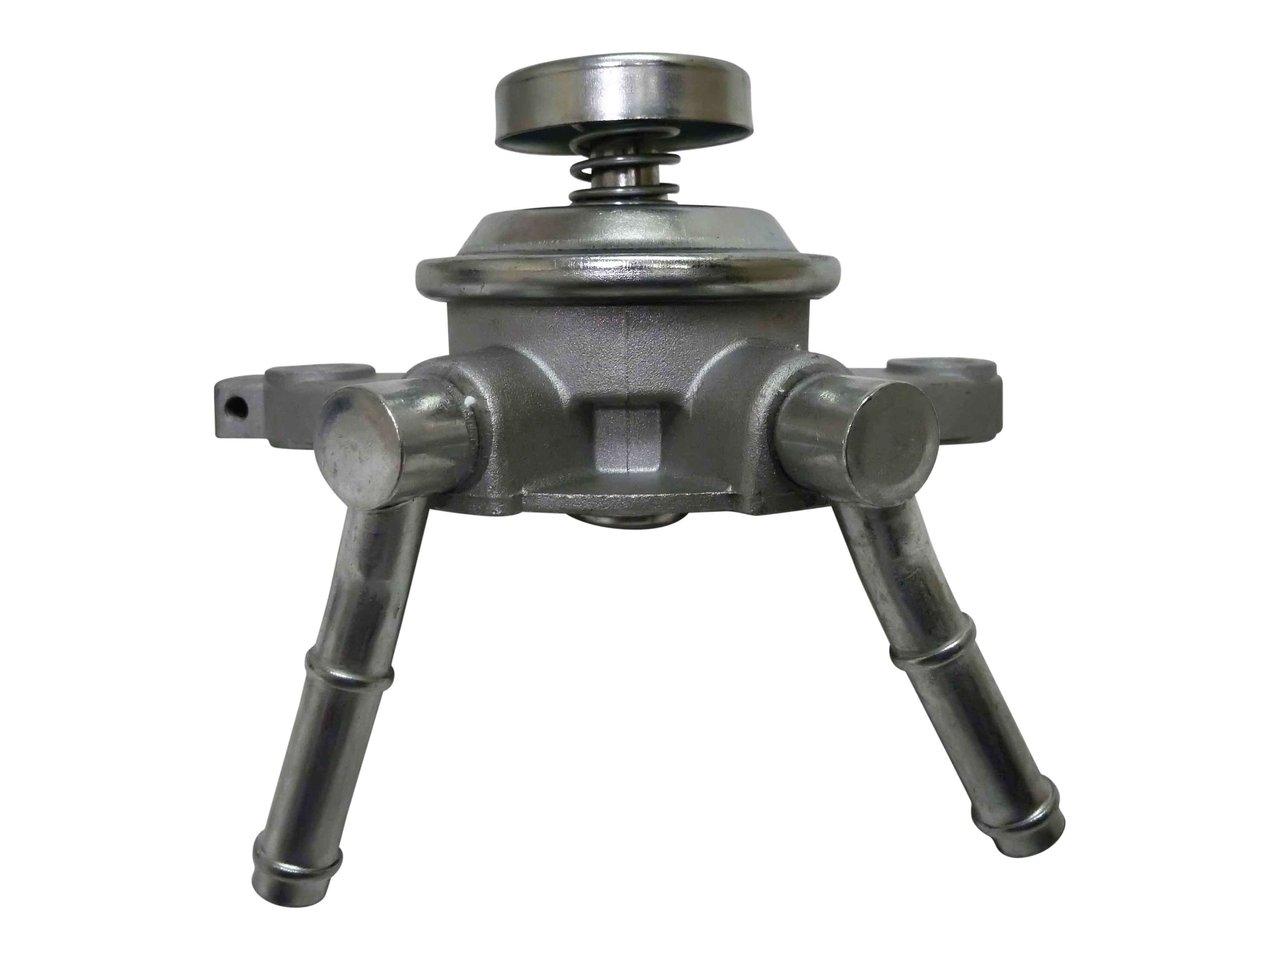 Fuel Filter Primer Pump Suitable For Landcruiser 75 Series Hzj75 7 3l Housing 42l Diesel